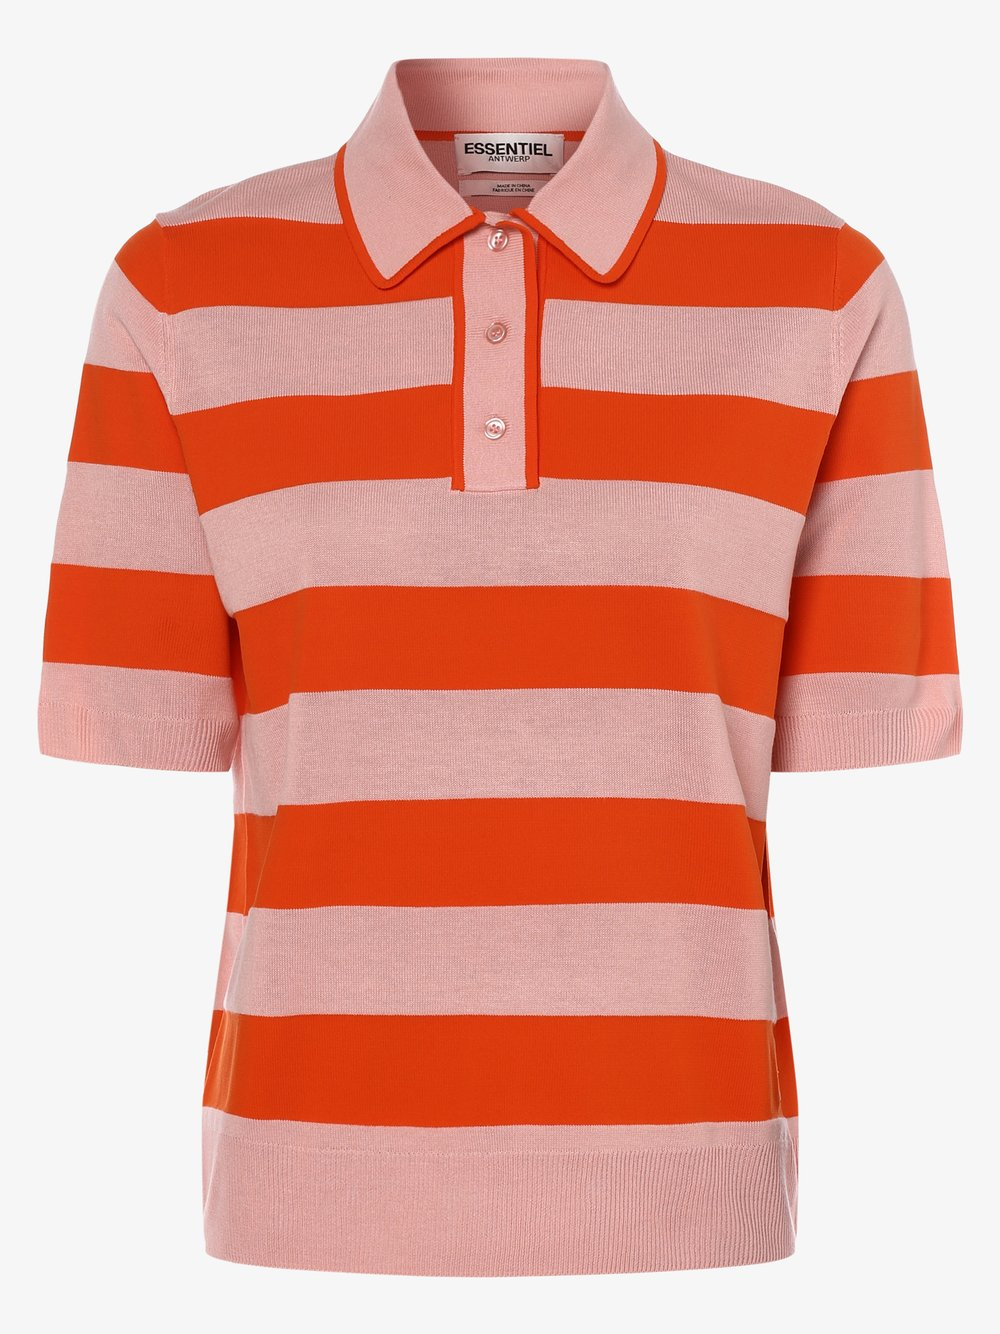 Essentiel Antwerp – Damska koszulka polo – Vailhac, pomarańczowy Van Graaf 464356-0001-09920